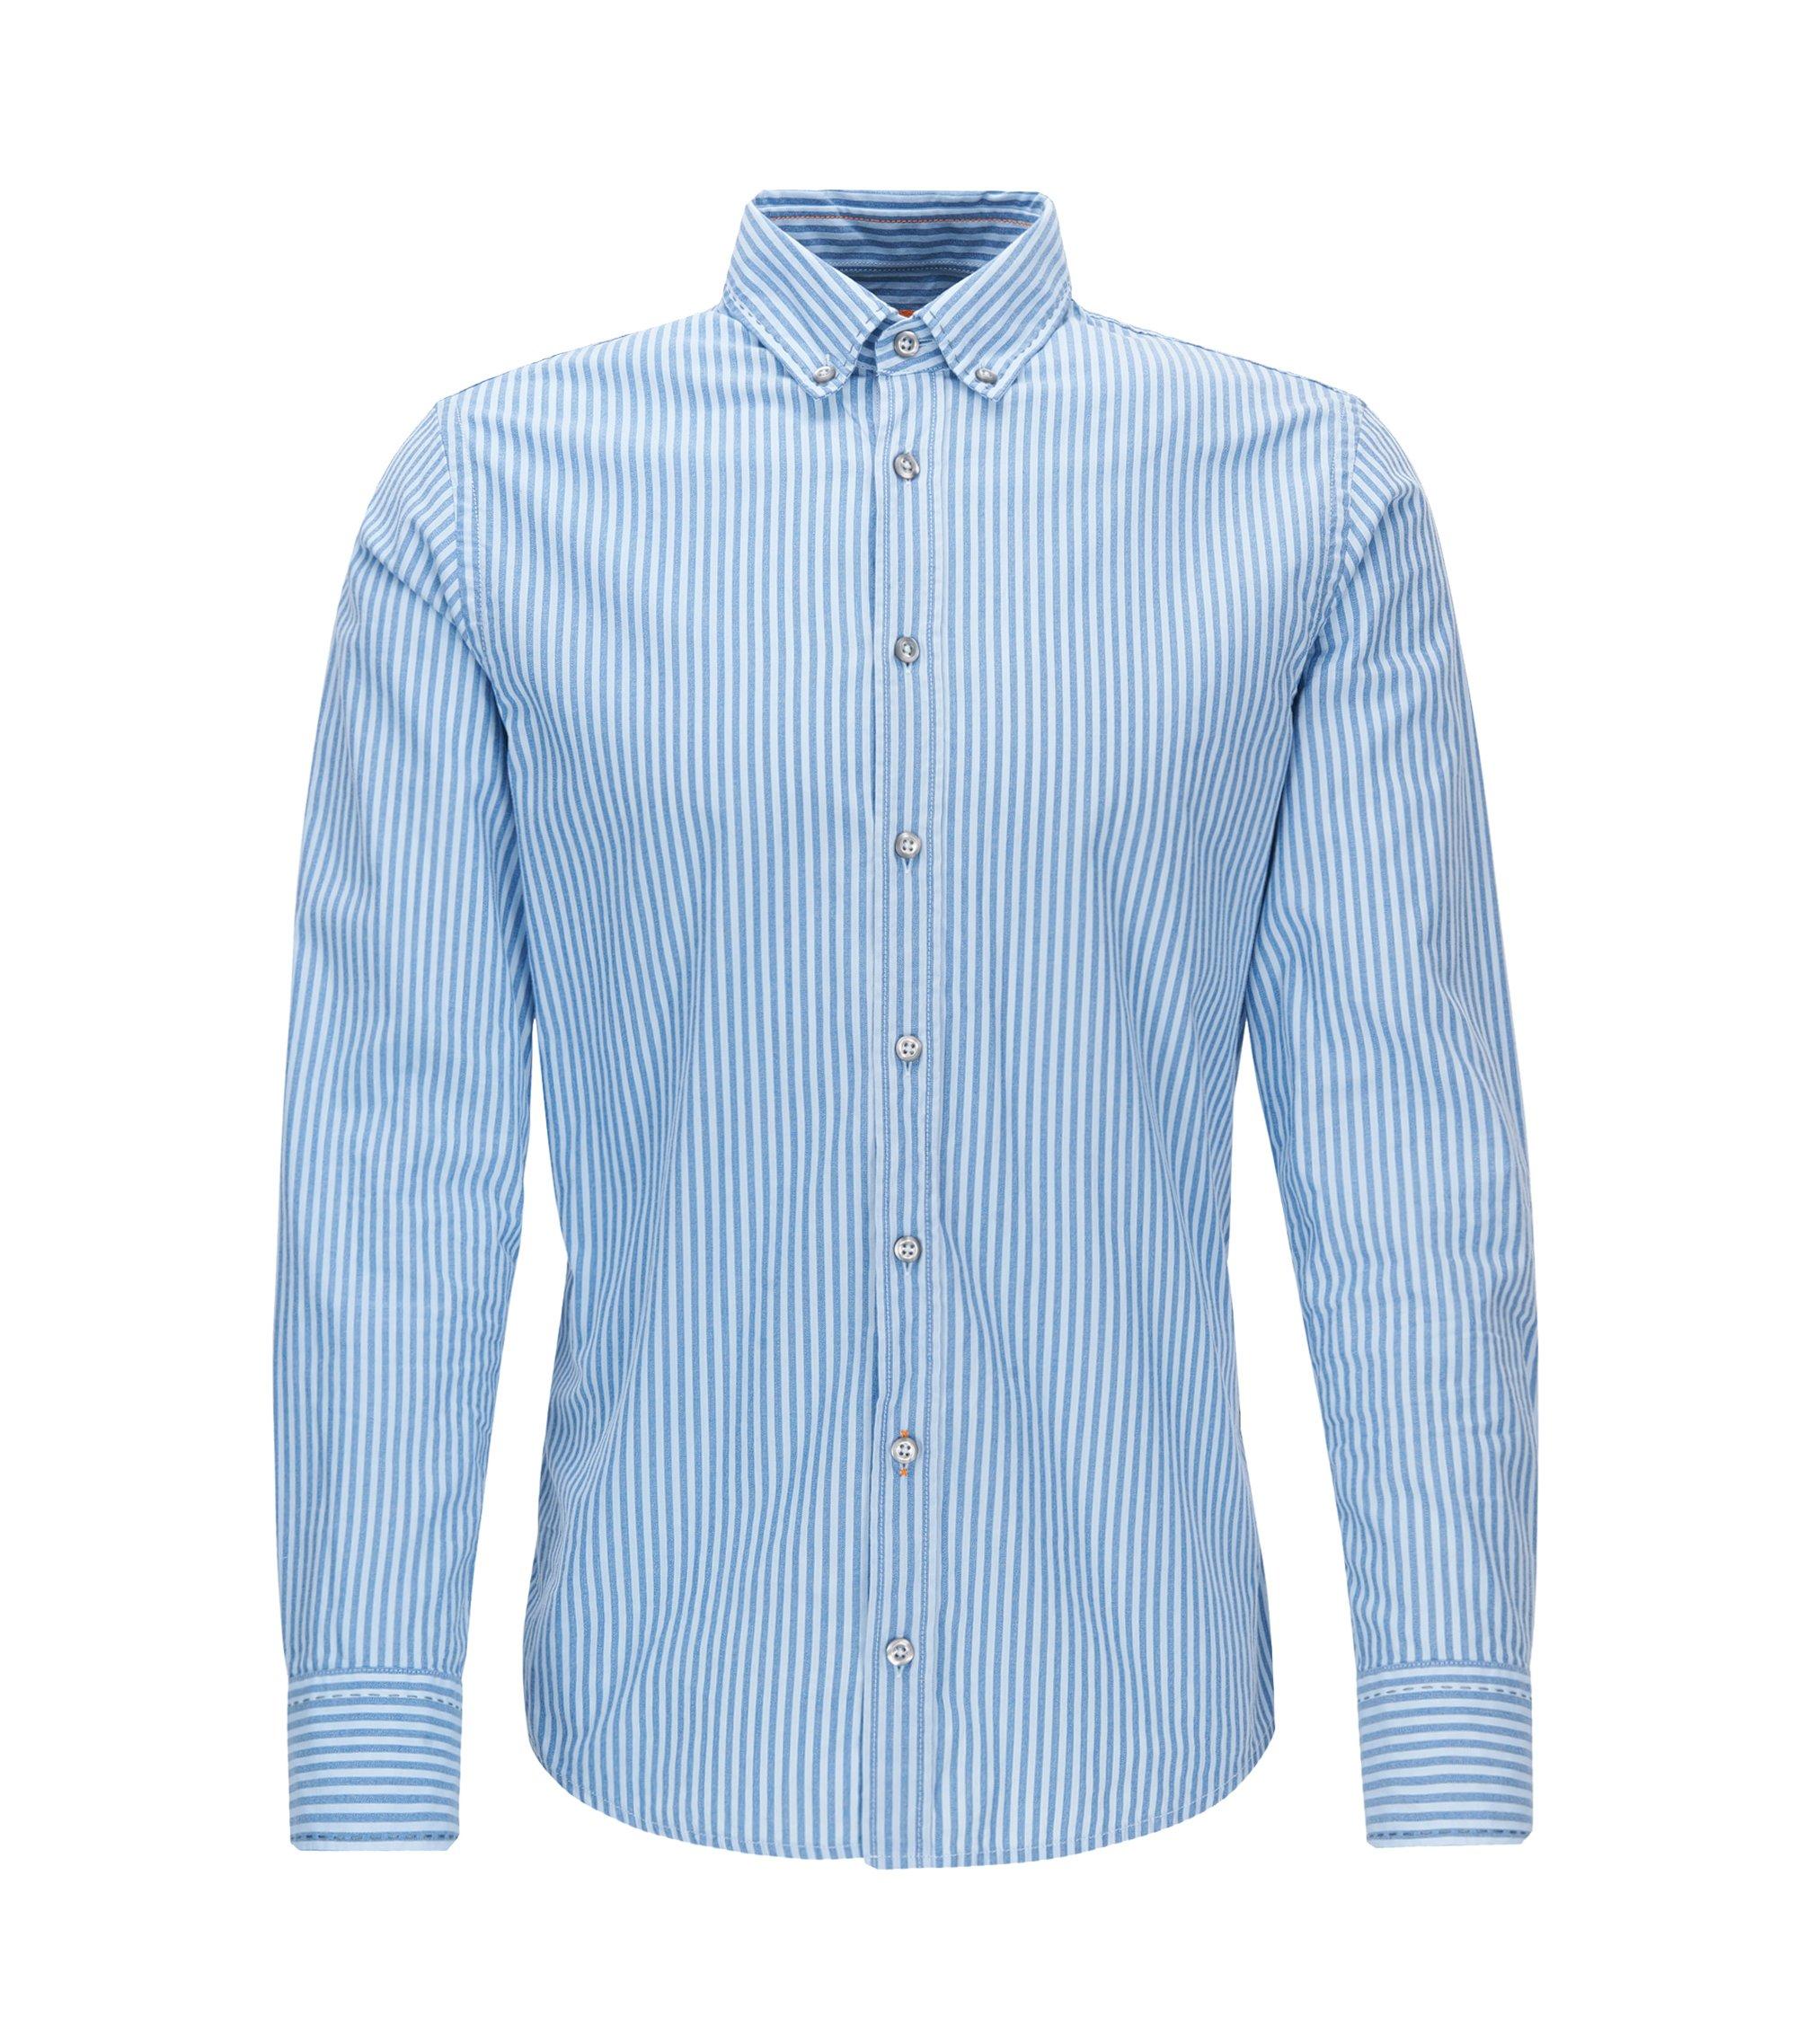 Gestreiftes Slim-Fit Hemd aus Baumwolle, Blau